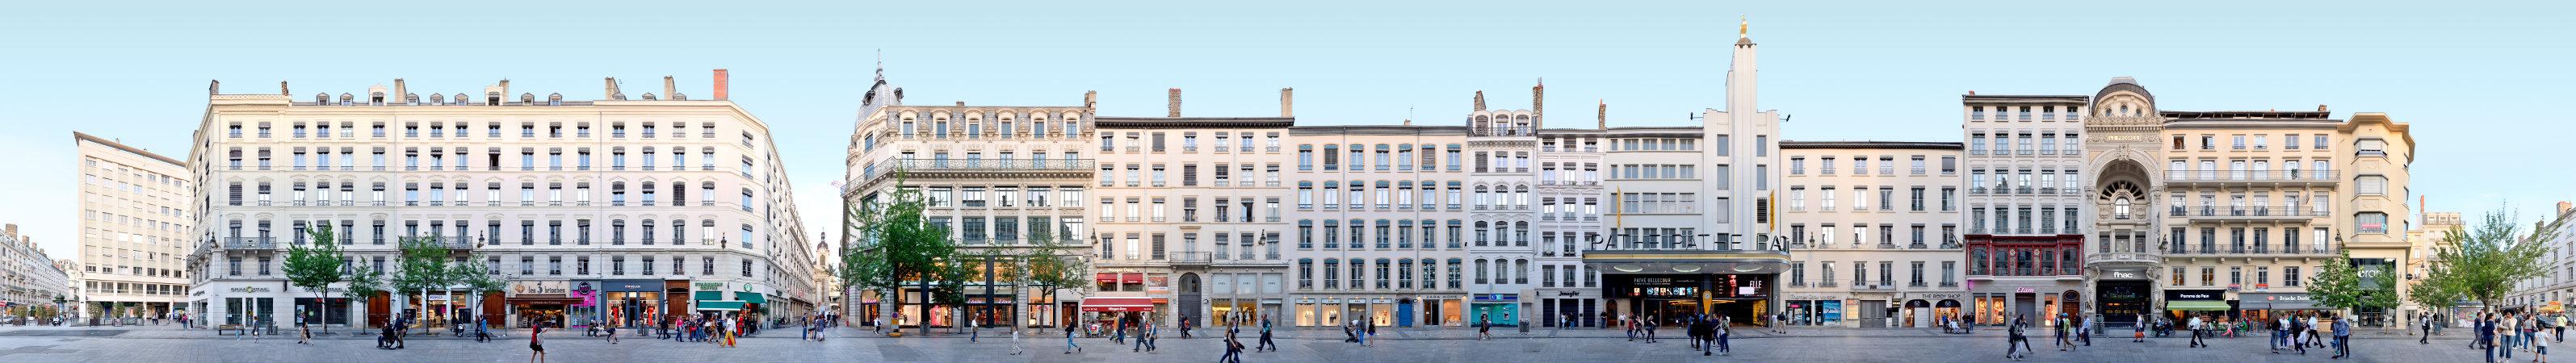 Rue de la Republique | Le Progres